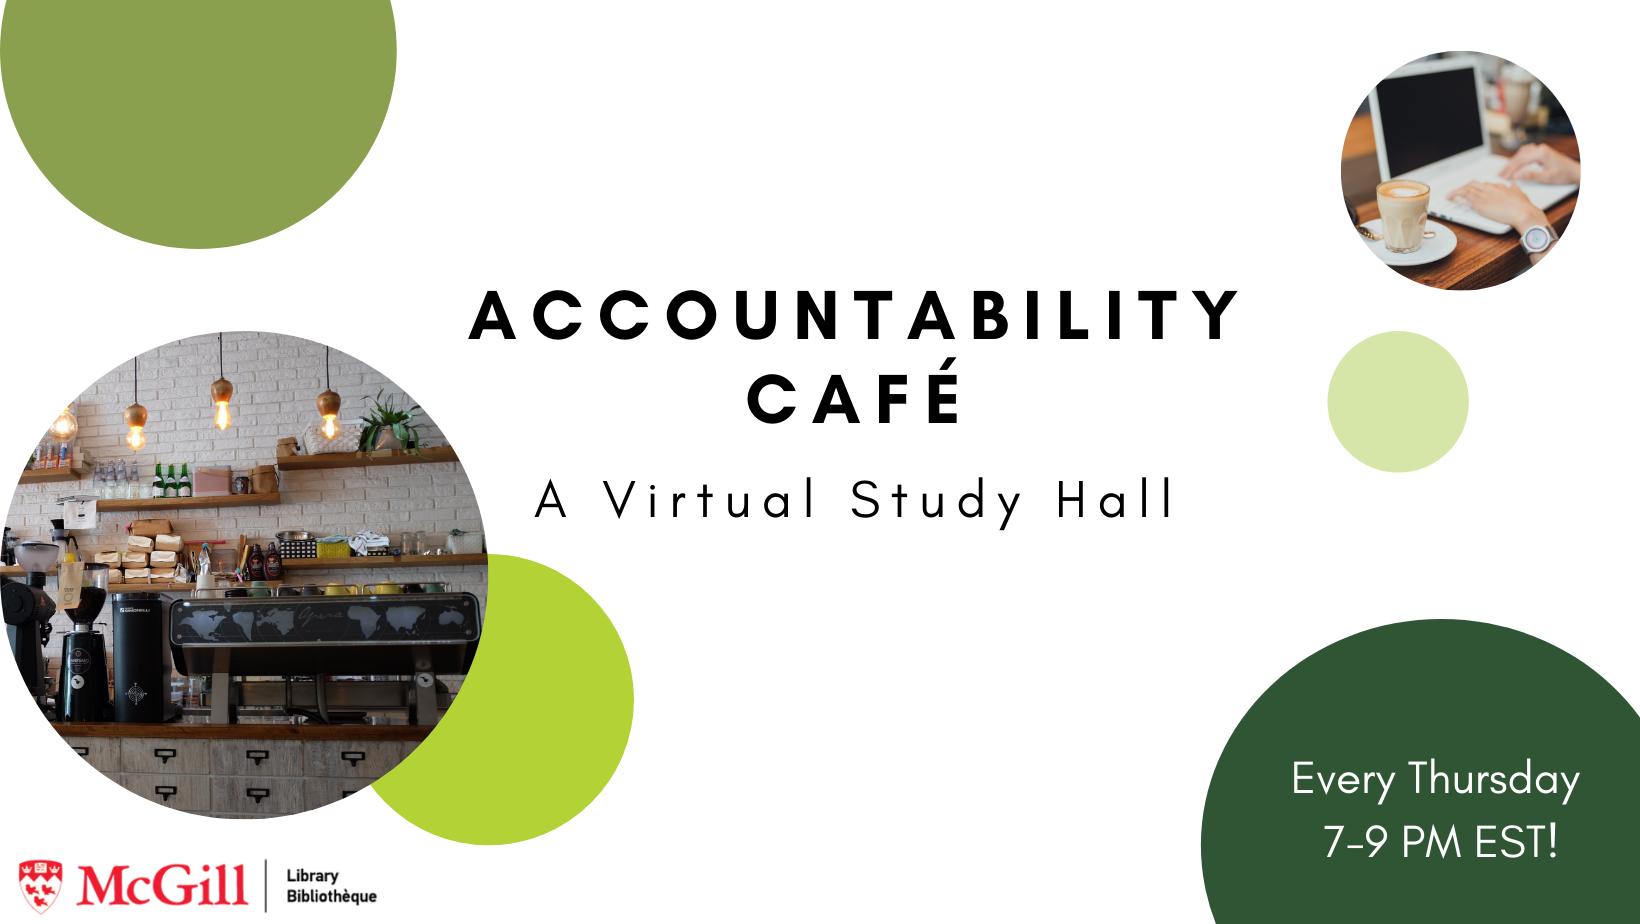 accountability cafe every thursday 7-9pm EST